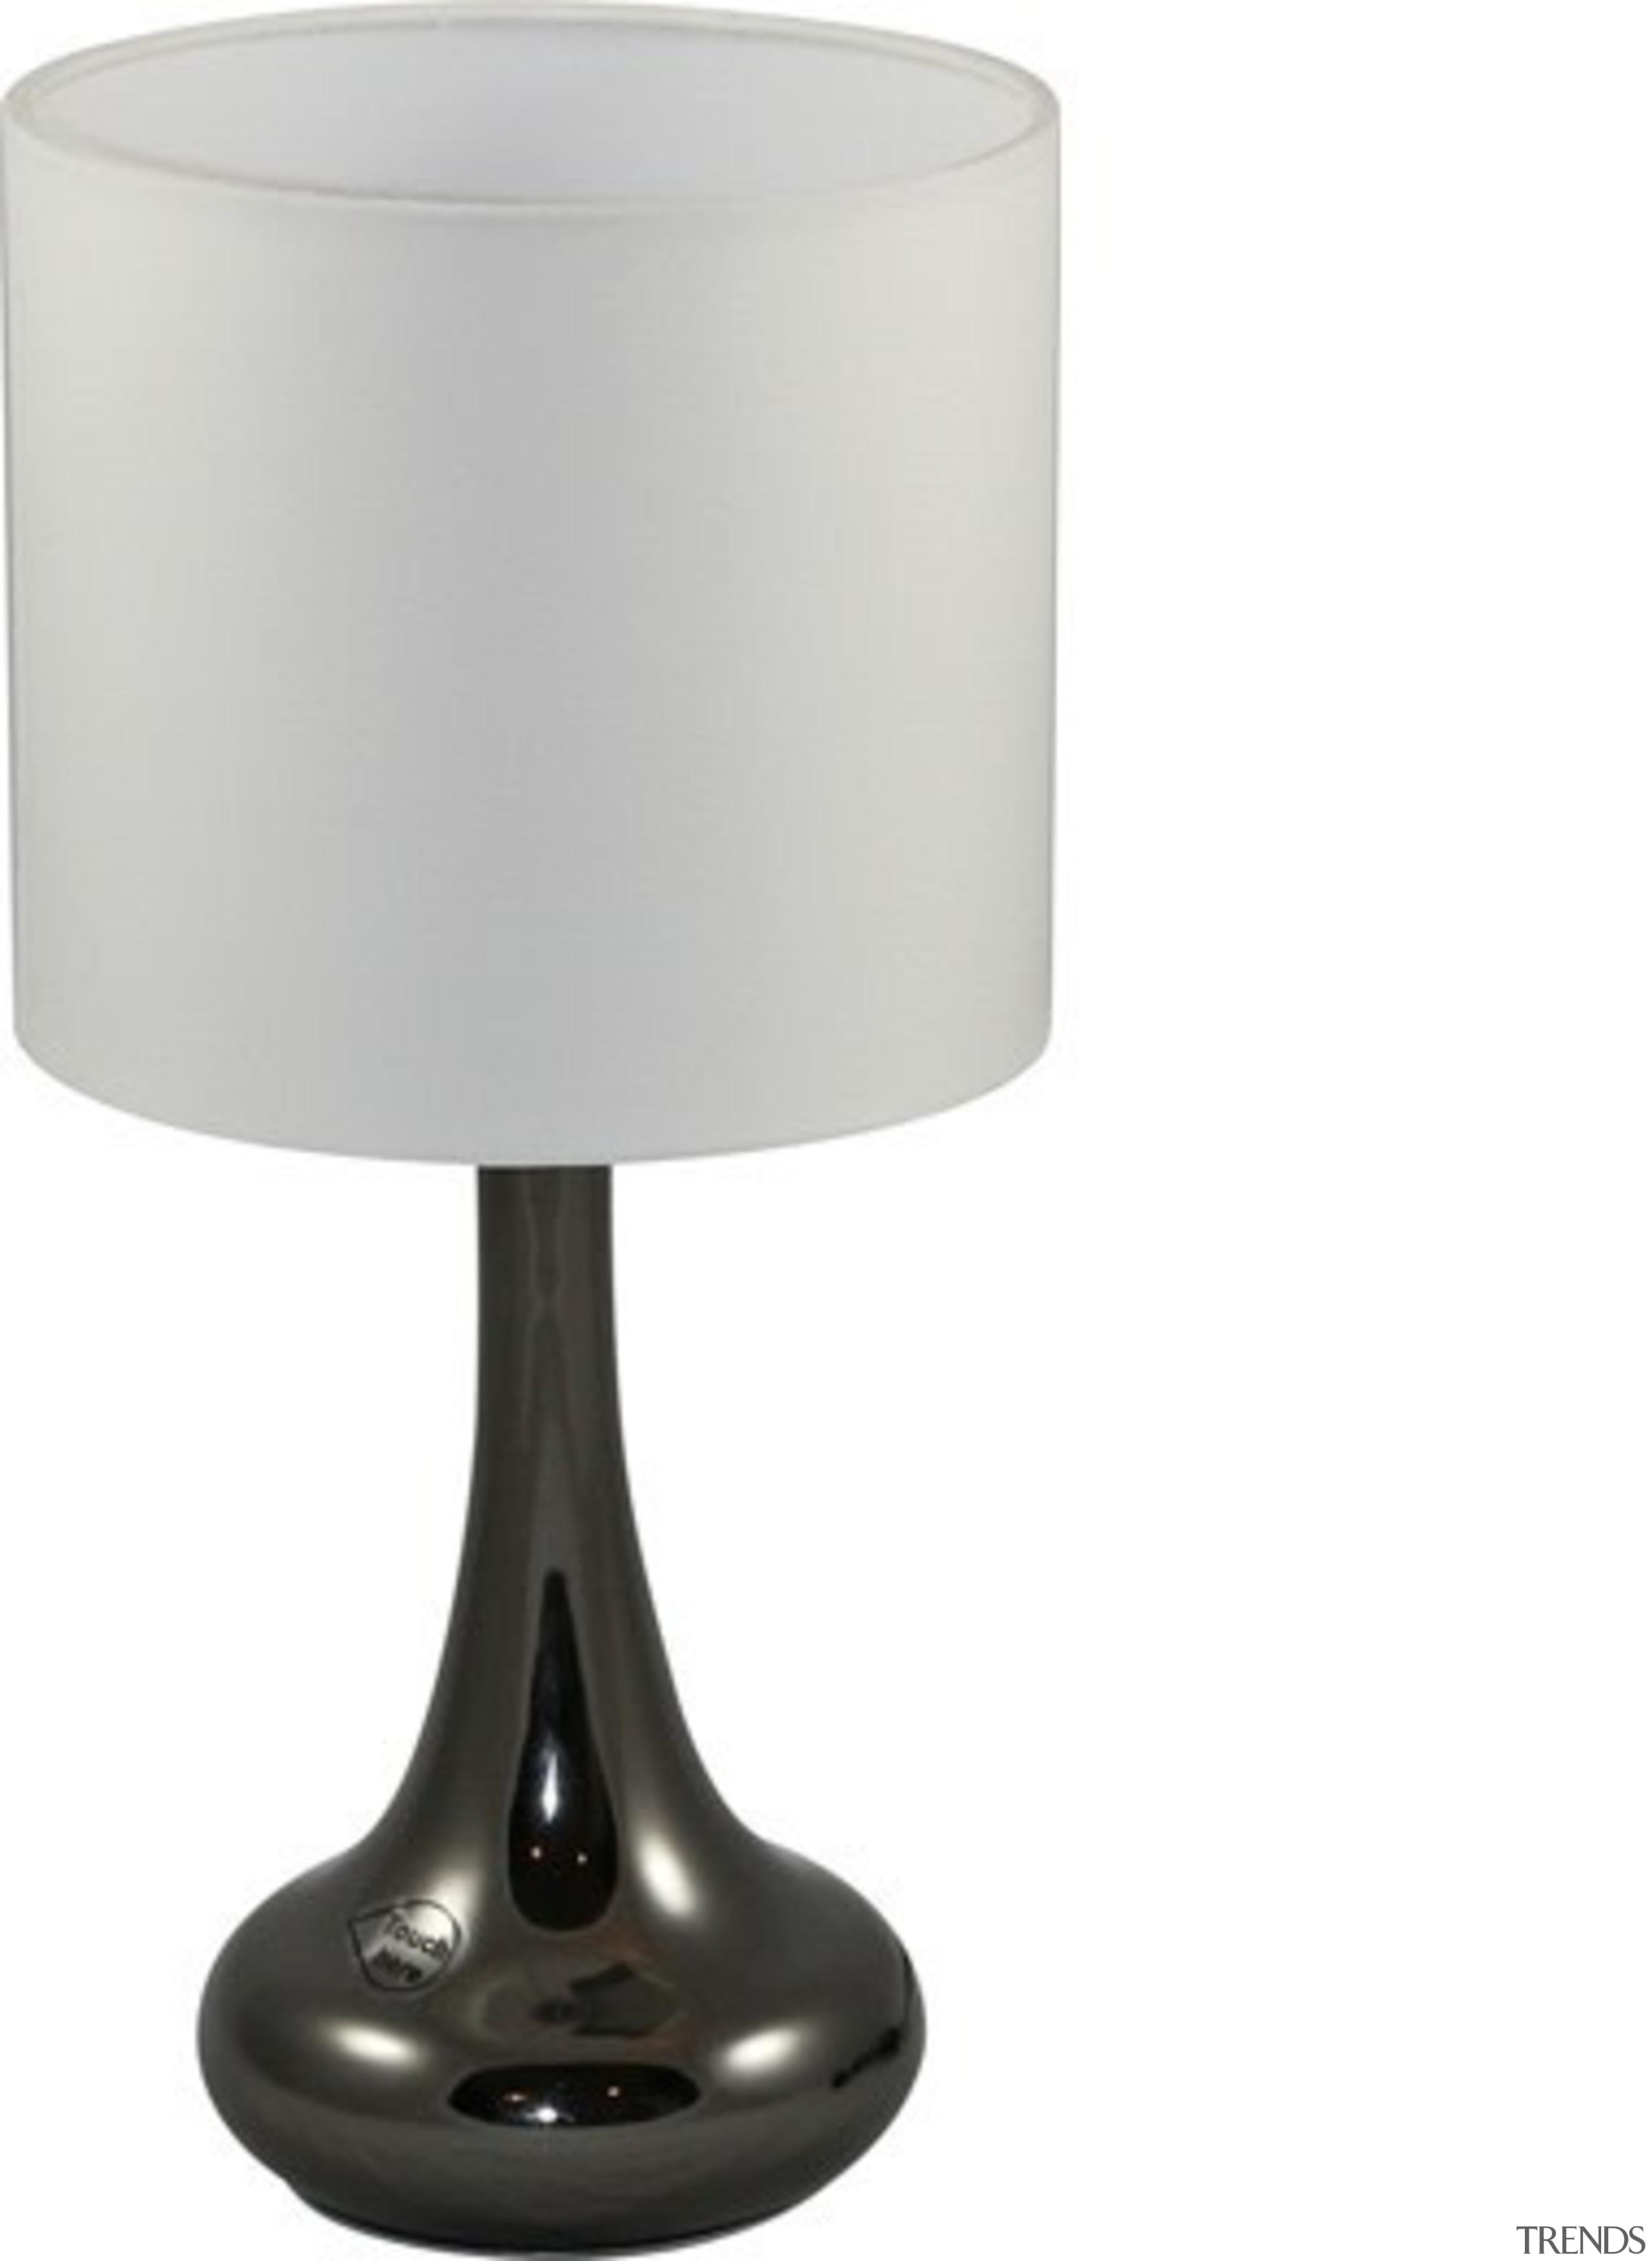 FeaturesA minimalist spun metal design complete with fabric furniture, lamp, light fixture, lighting, product design, table, white